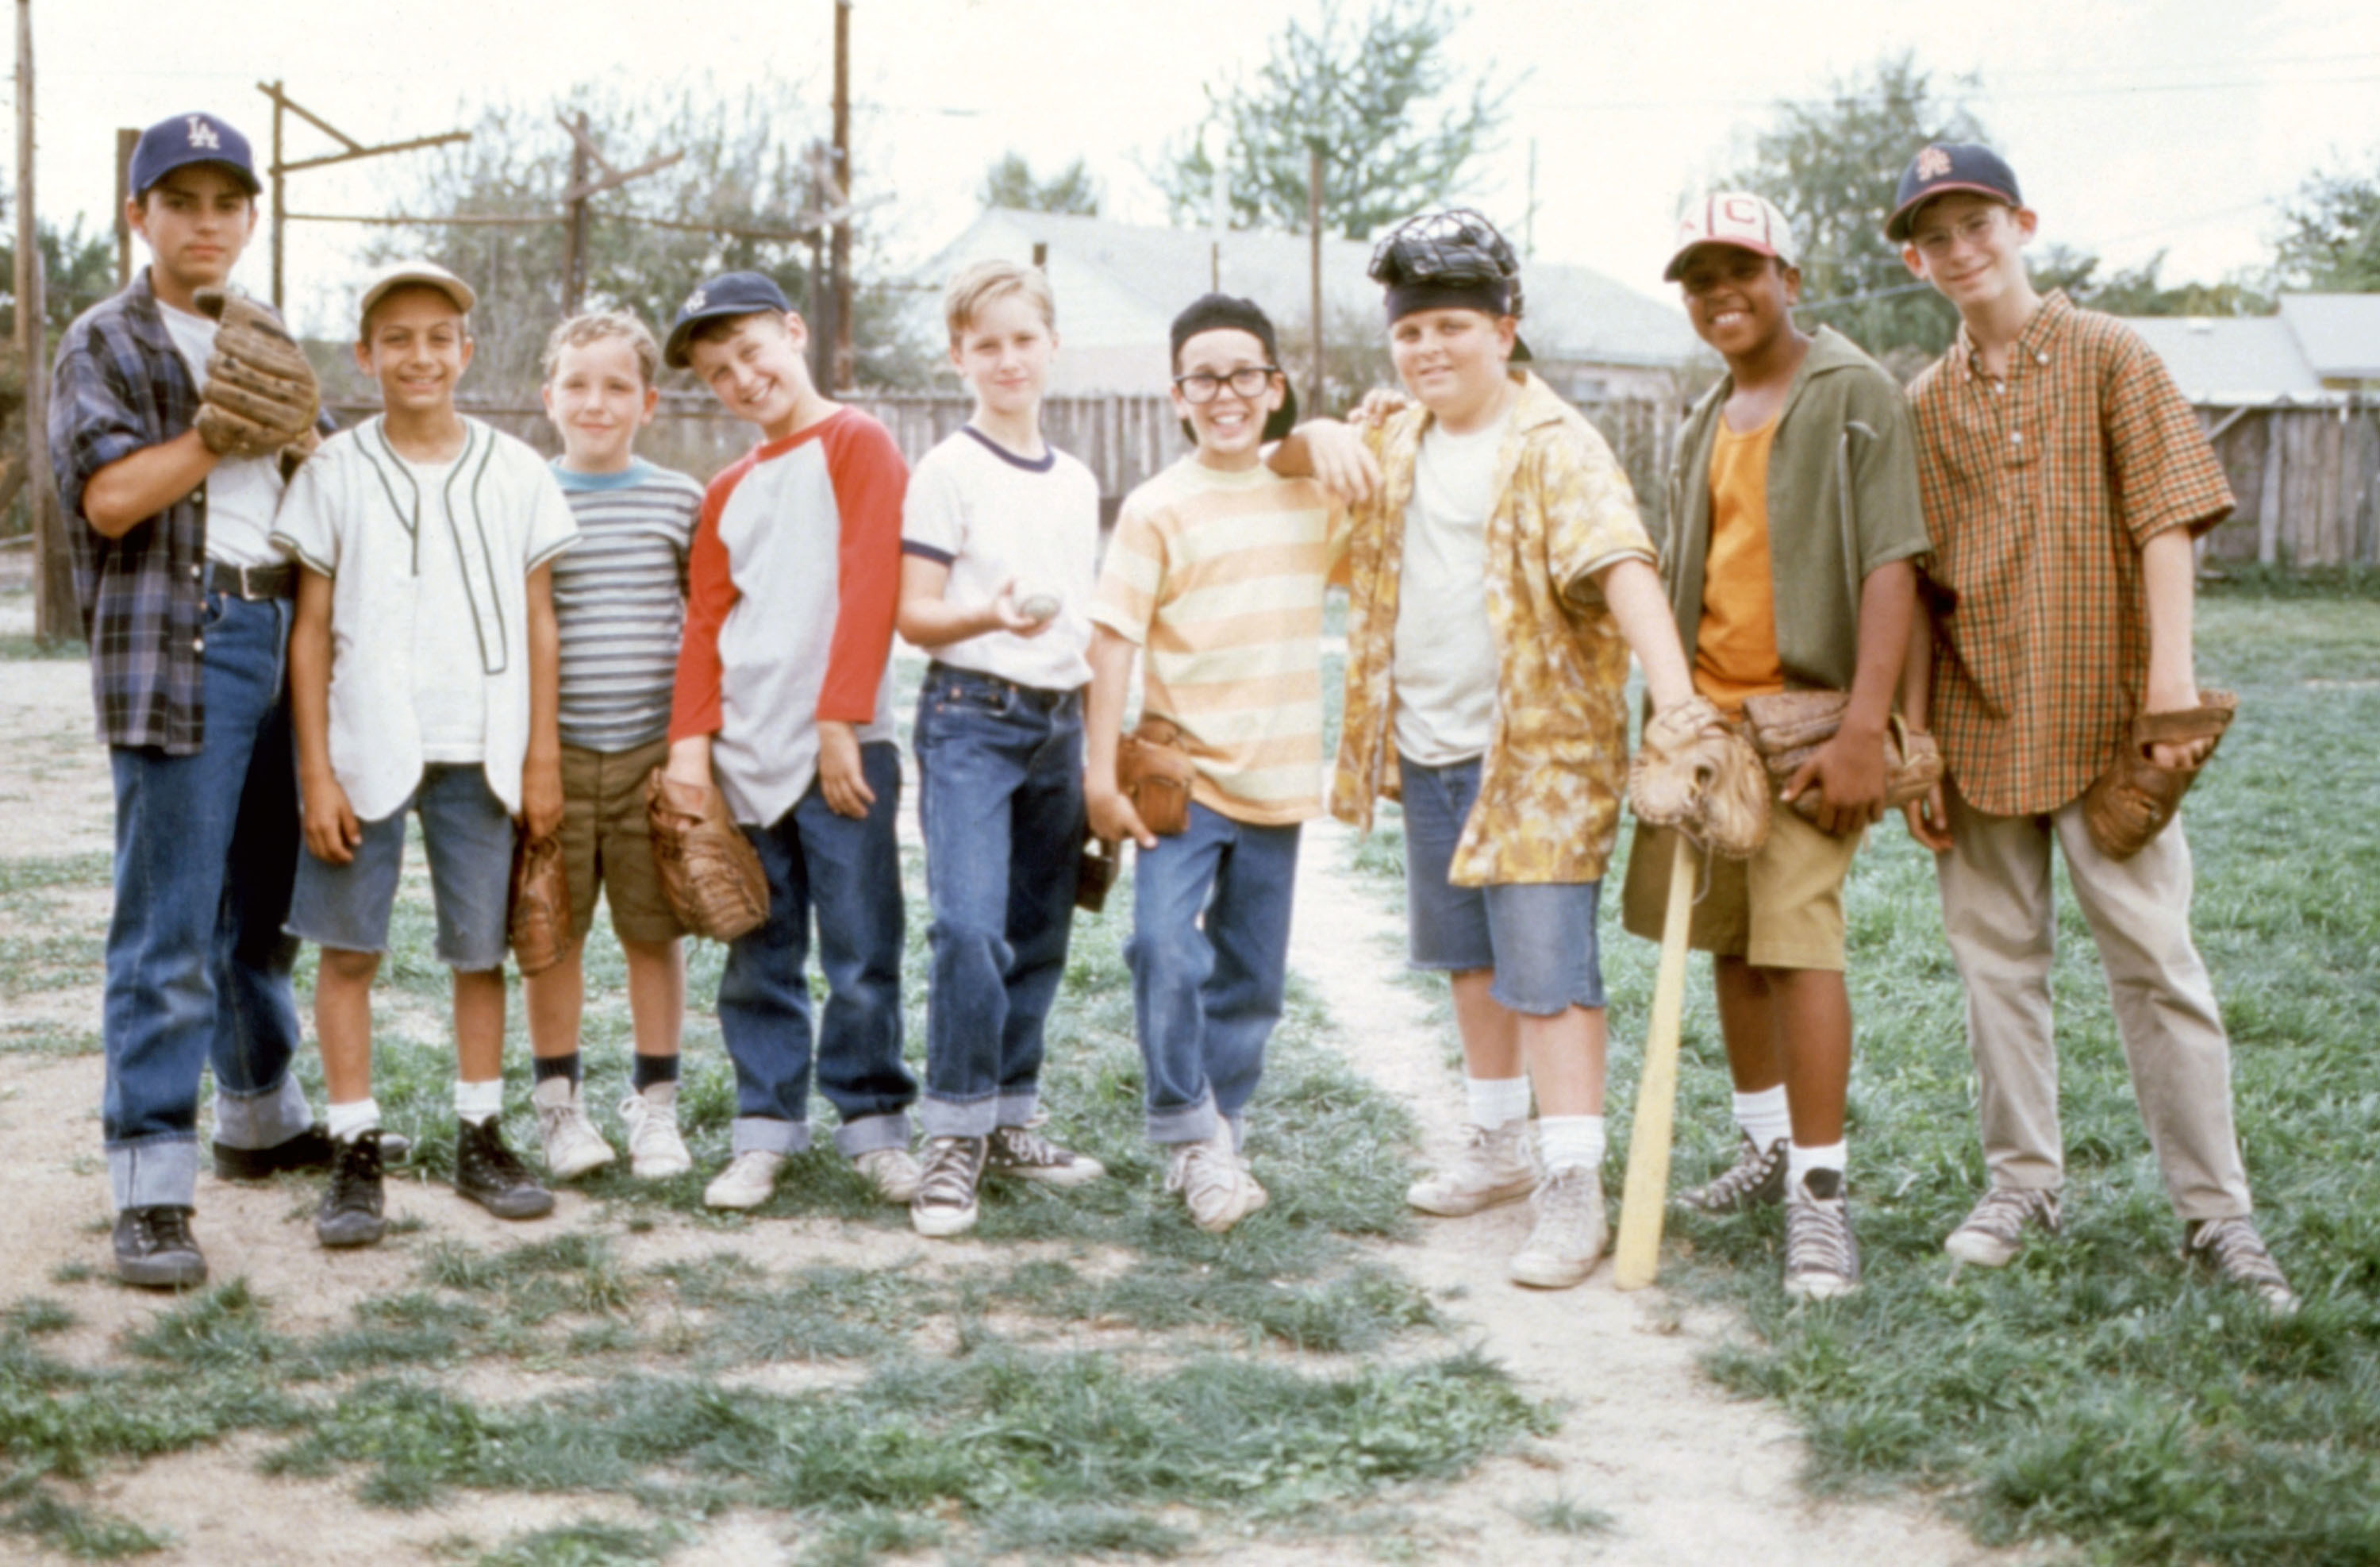 Mike Vitar, Marty York, Shane Obedzinski, Victor DiMattia, Tom Guiry, Chauncey Leopardi, Patrick Renna, Brandon Adams, and Grant Gelt stand on a baseball field